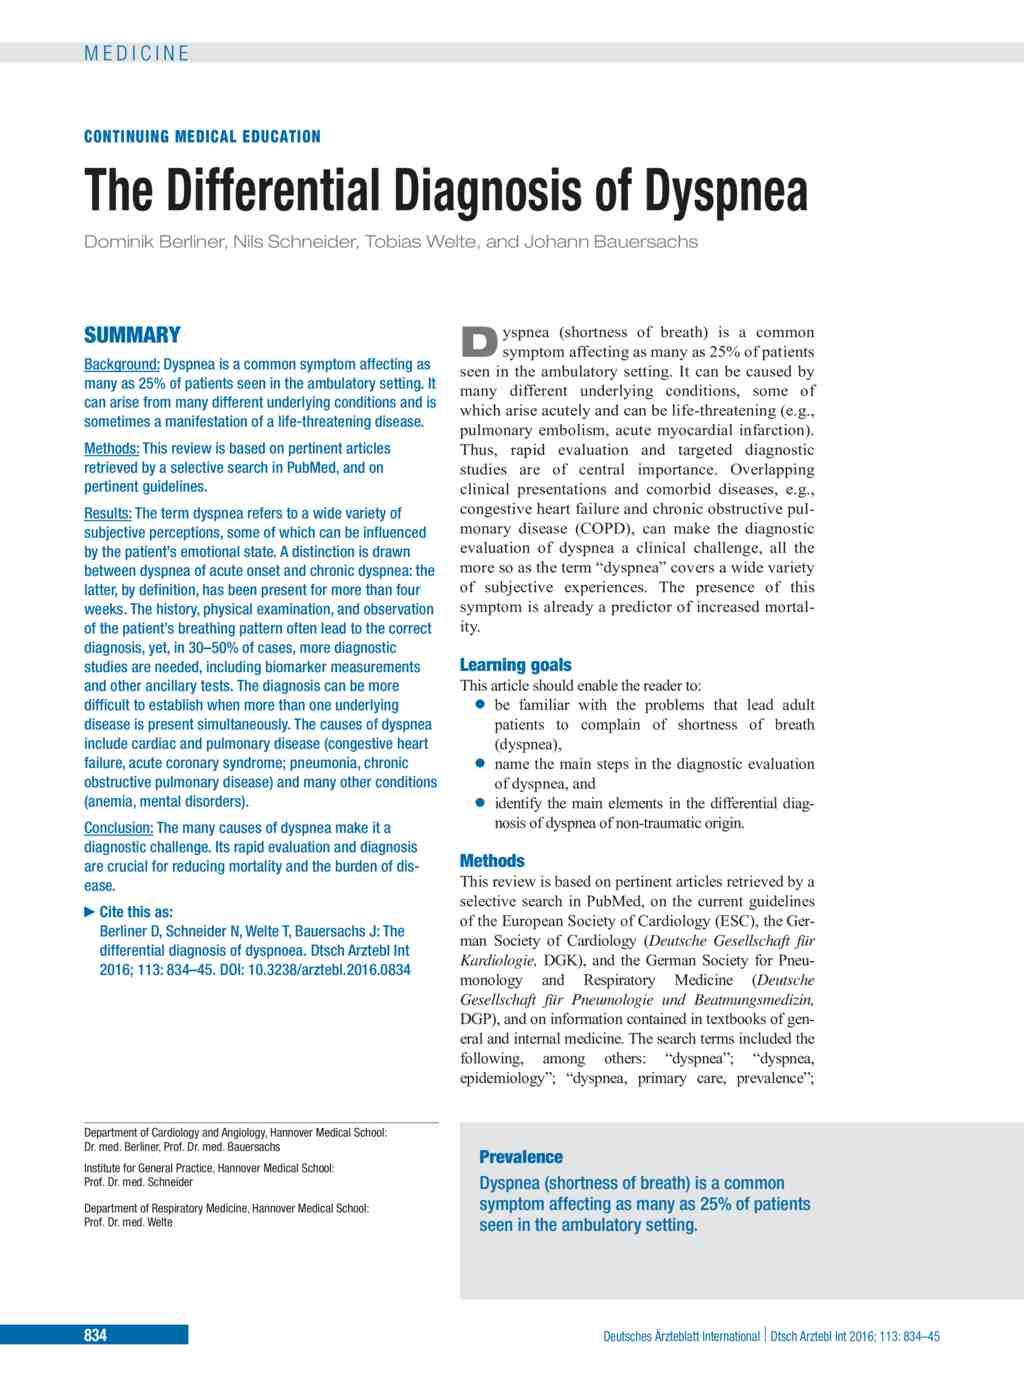 Dyspnea when walking. Severe shortness of breath when walking: causes, treatment 83